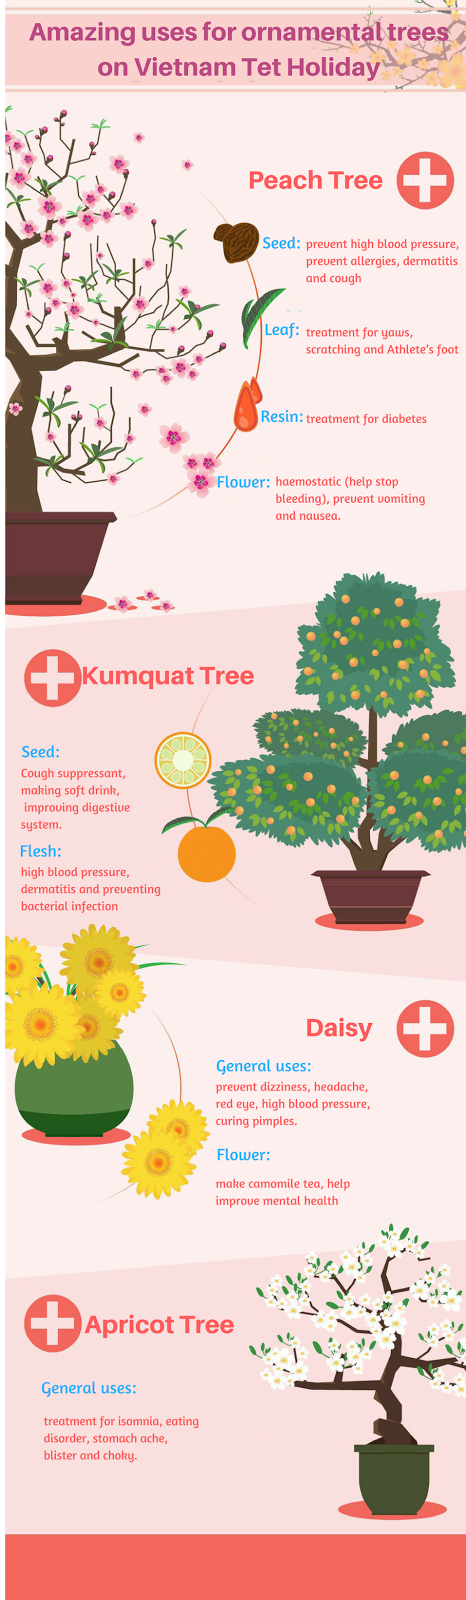 Tet holiday ornamental tree